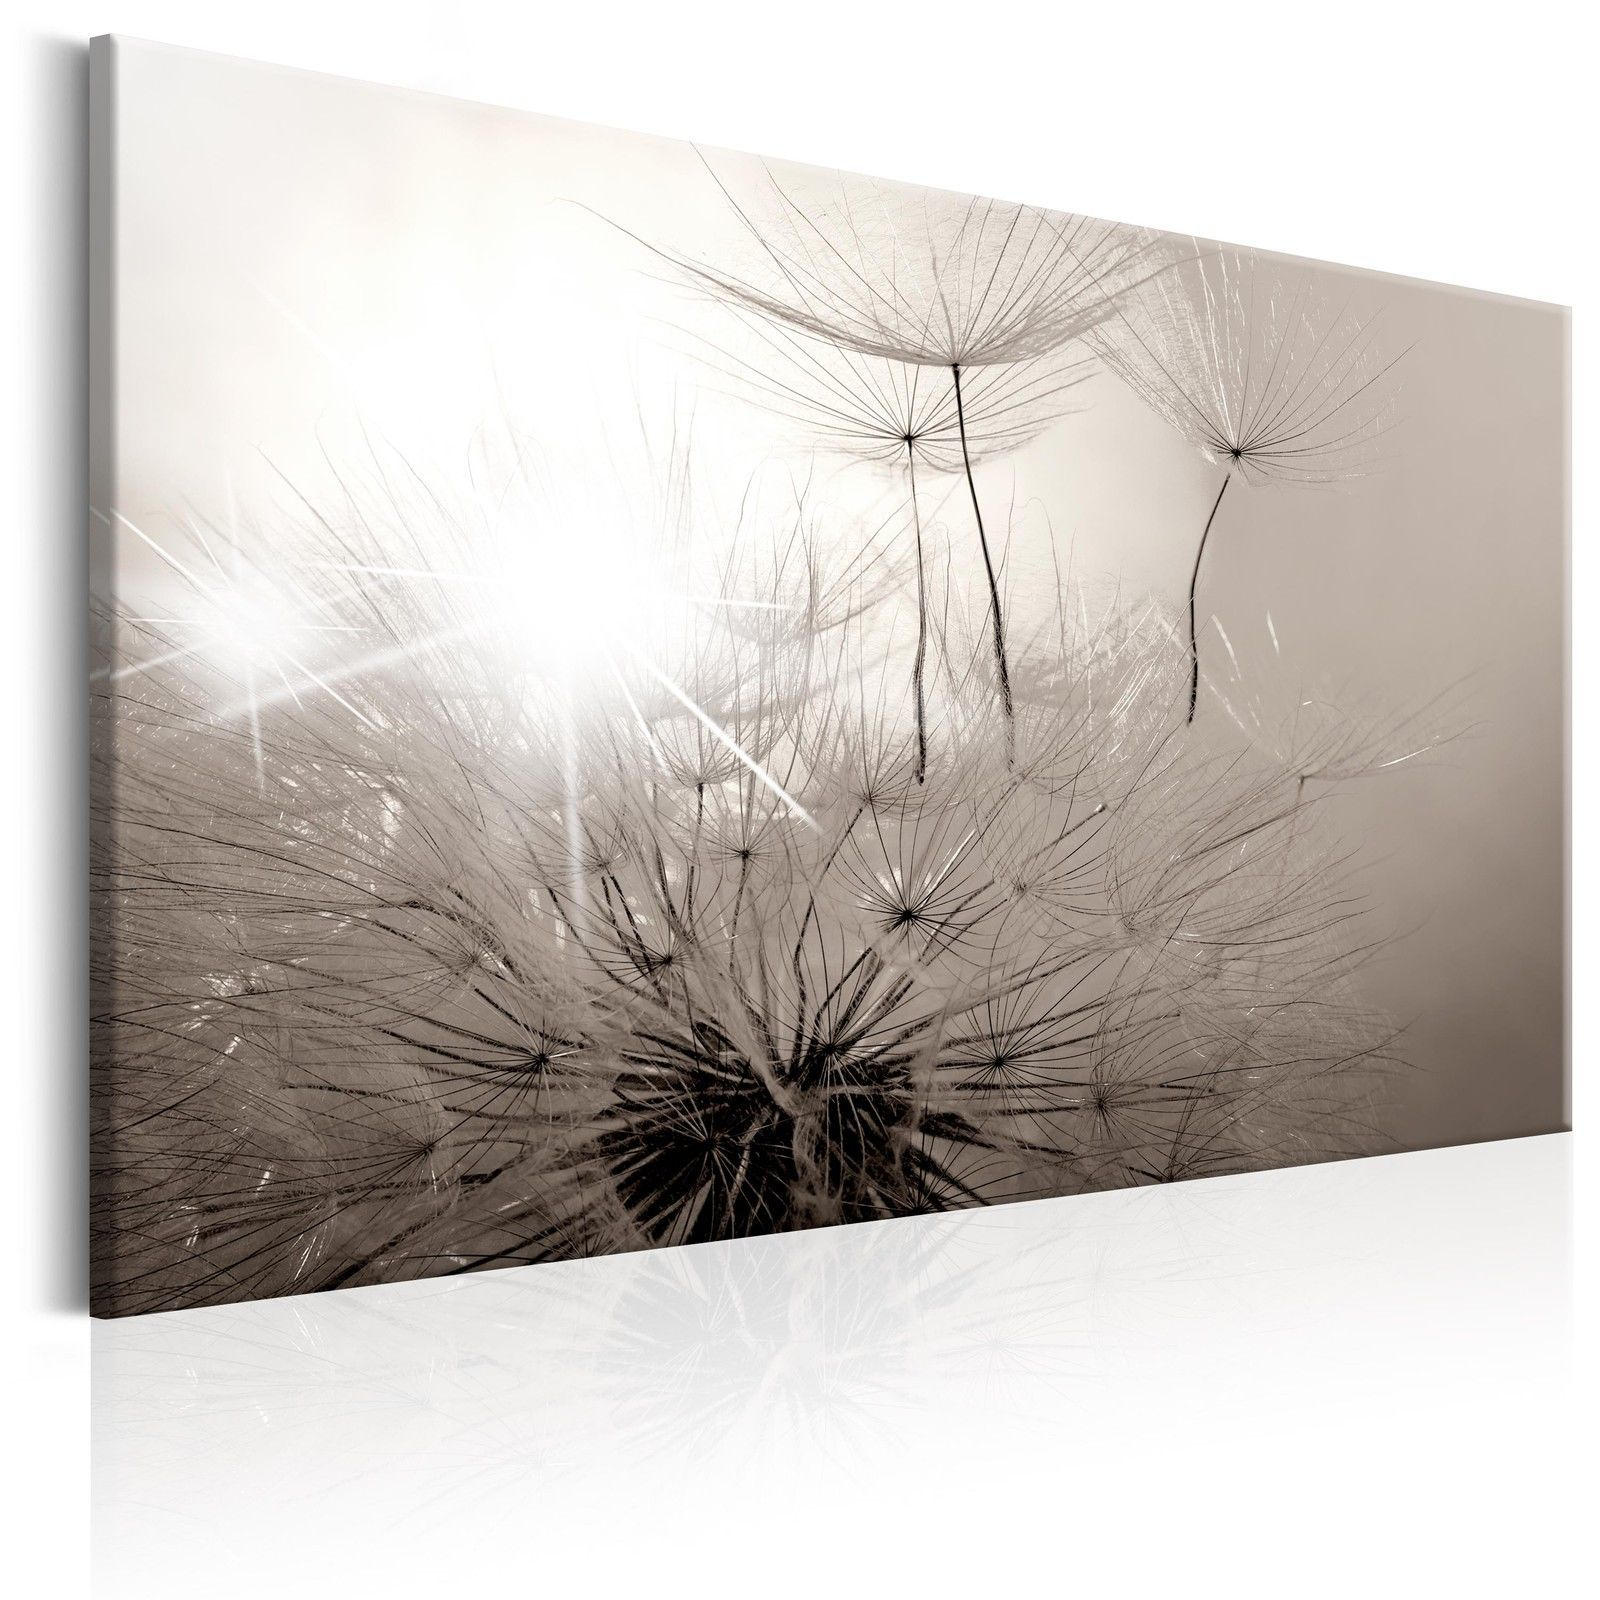 Vlies Leinwand Bilder Wandbilder Pusteblume Natur Grau Schwarz Weiß B B 0241 B A Ebay Bild Pusteblume Wandbilder Bilder